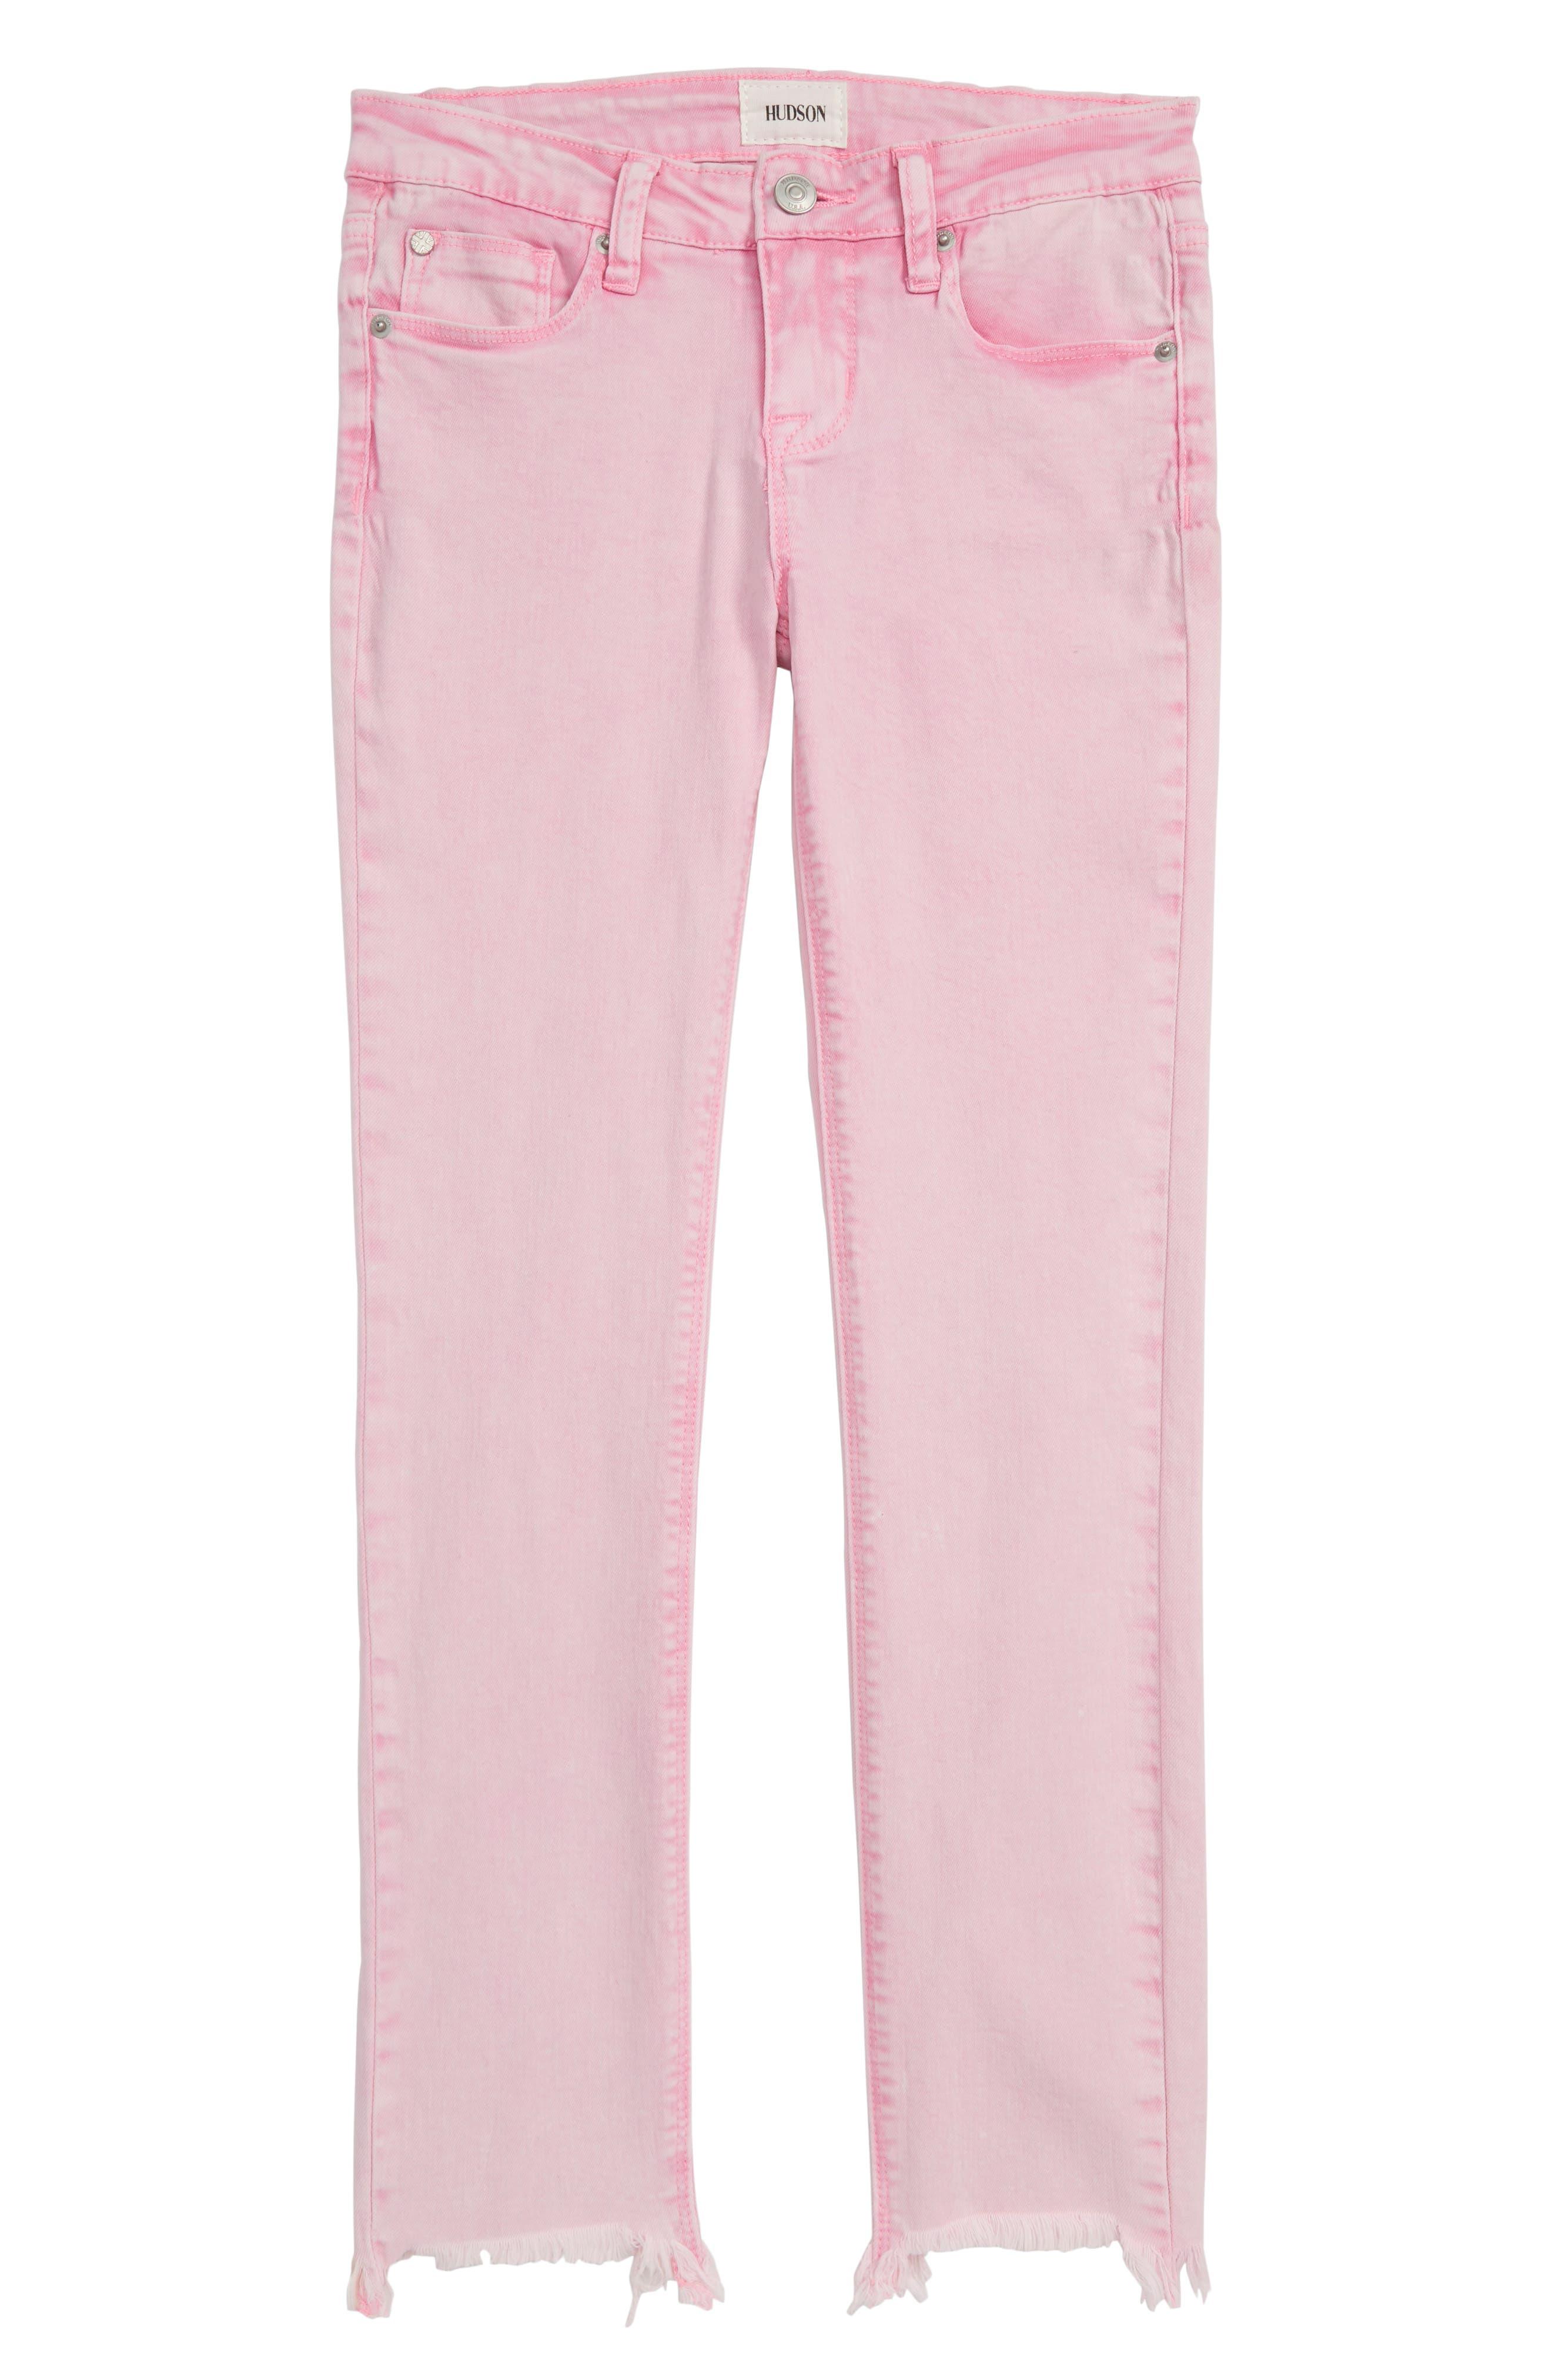 Wren Skinny Jeans,                             Main thumbnail 1, color,                             WATERMELON